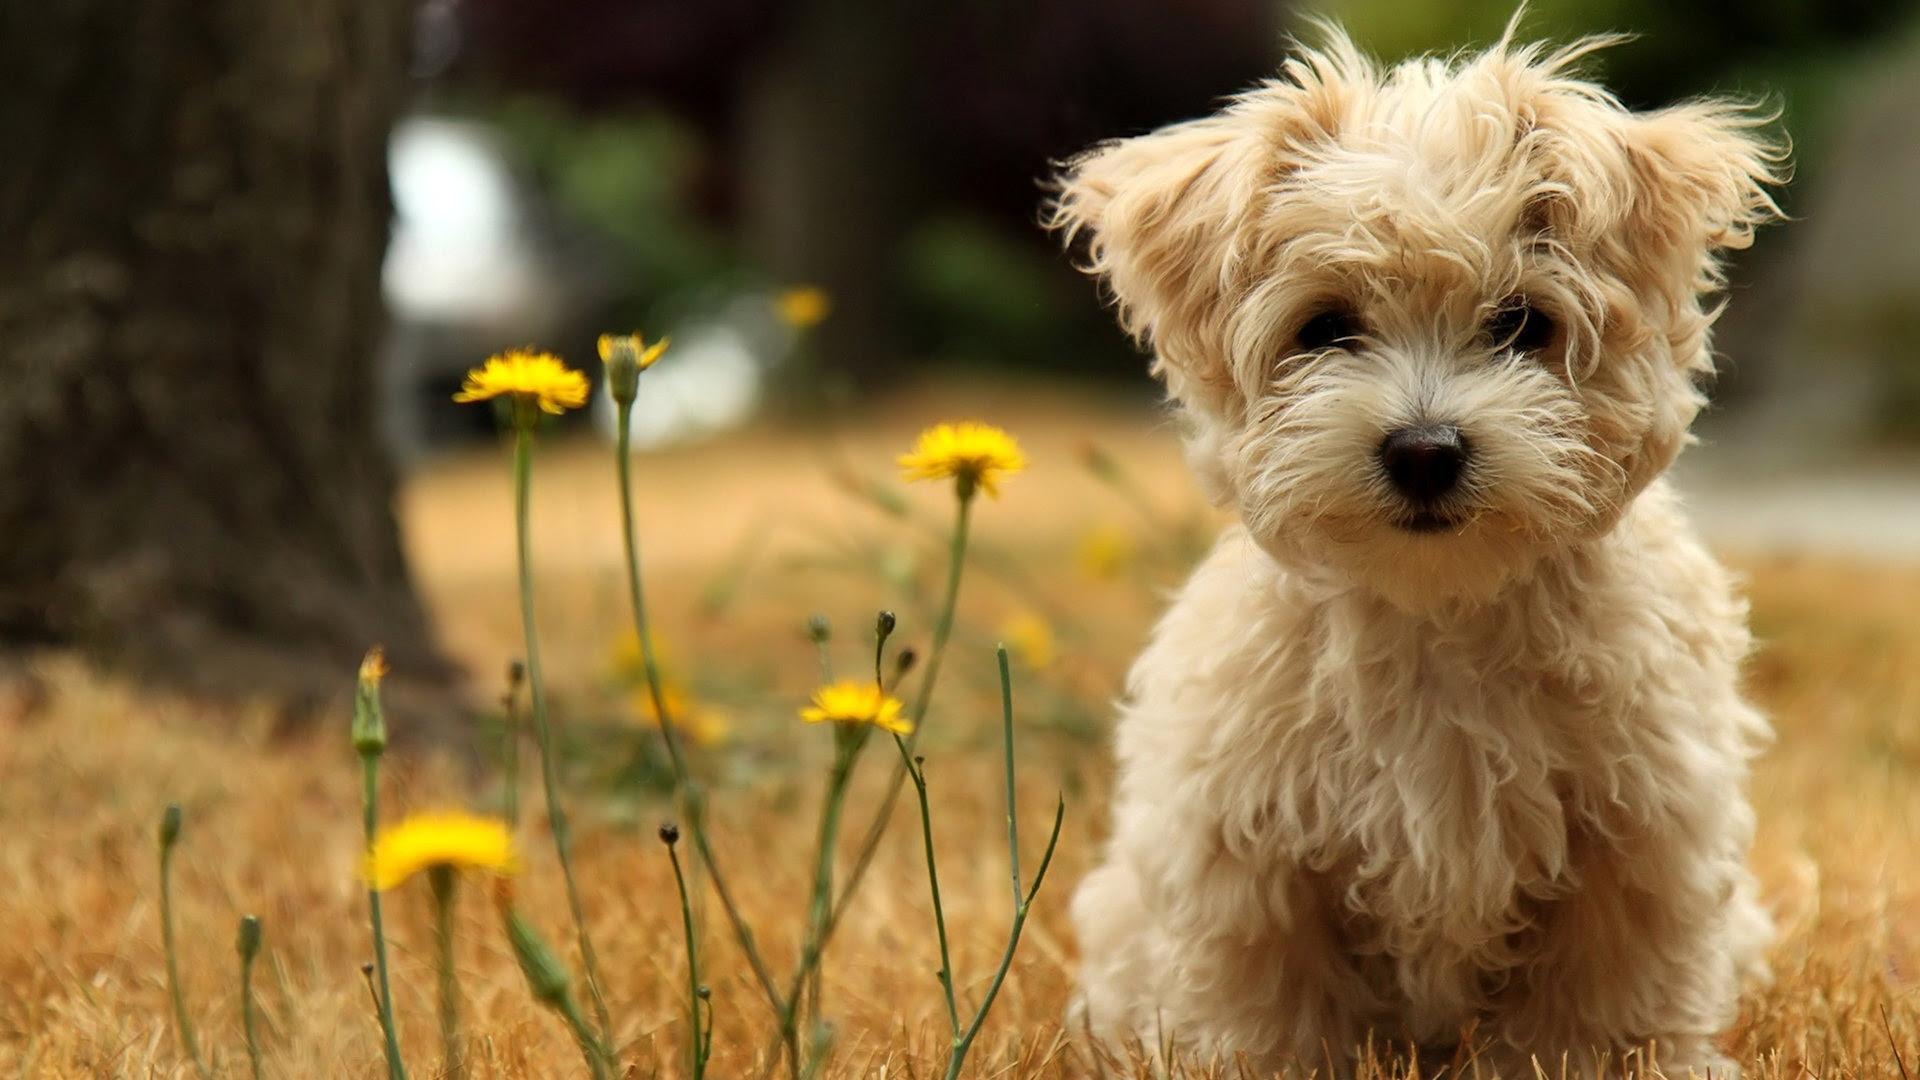 Cute Dog Wallpaper Animal Wallpaper  WallpaperLepi